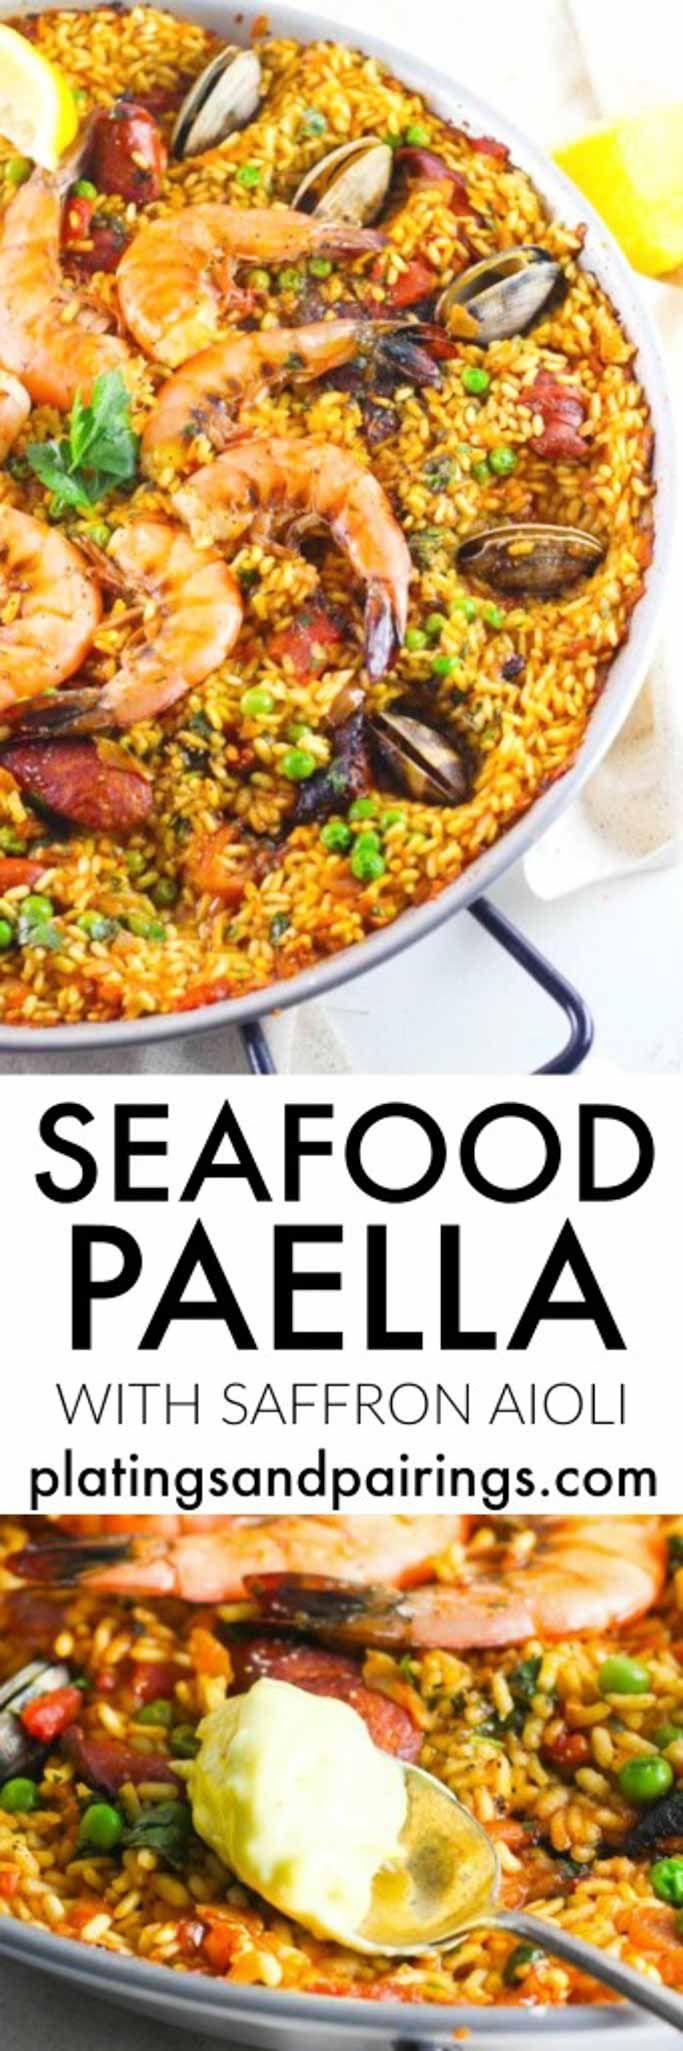 Seafood Paella with Saffron Aioli - This Paella is SURE to impress! | platingsandpairings.com